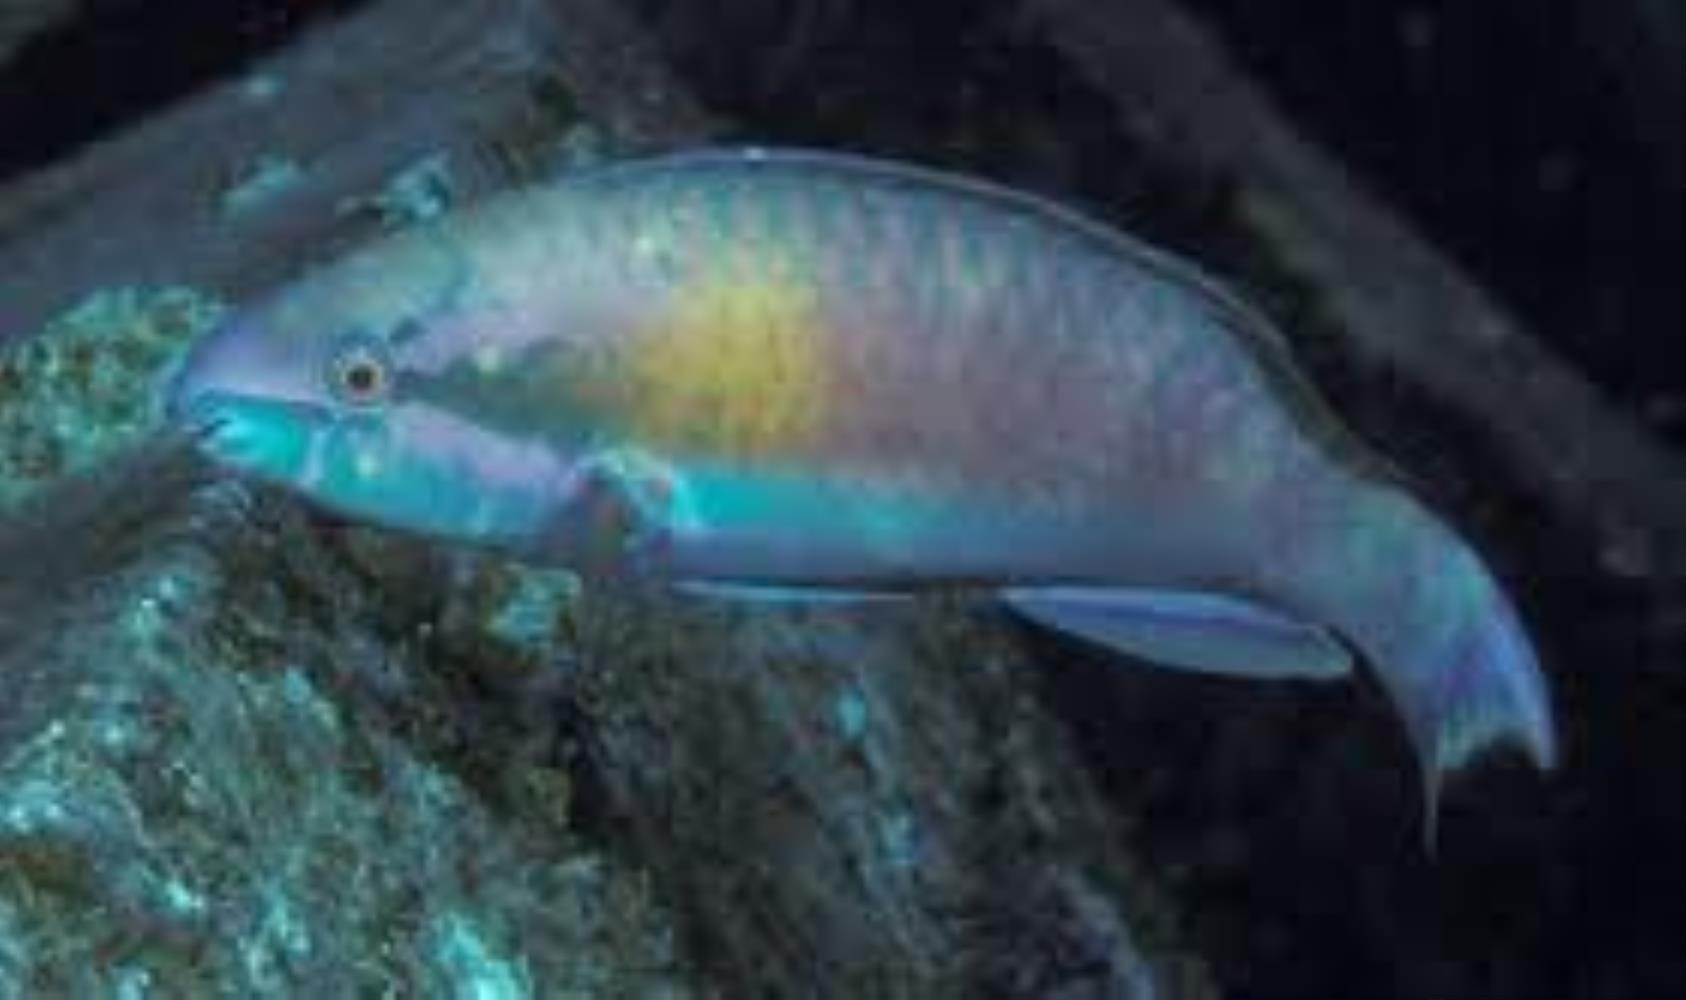 Darktail Parrotfish